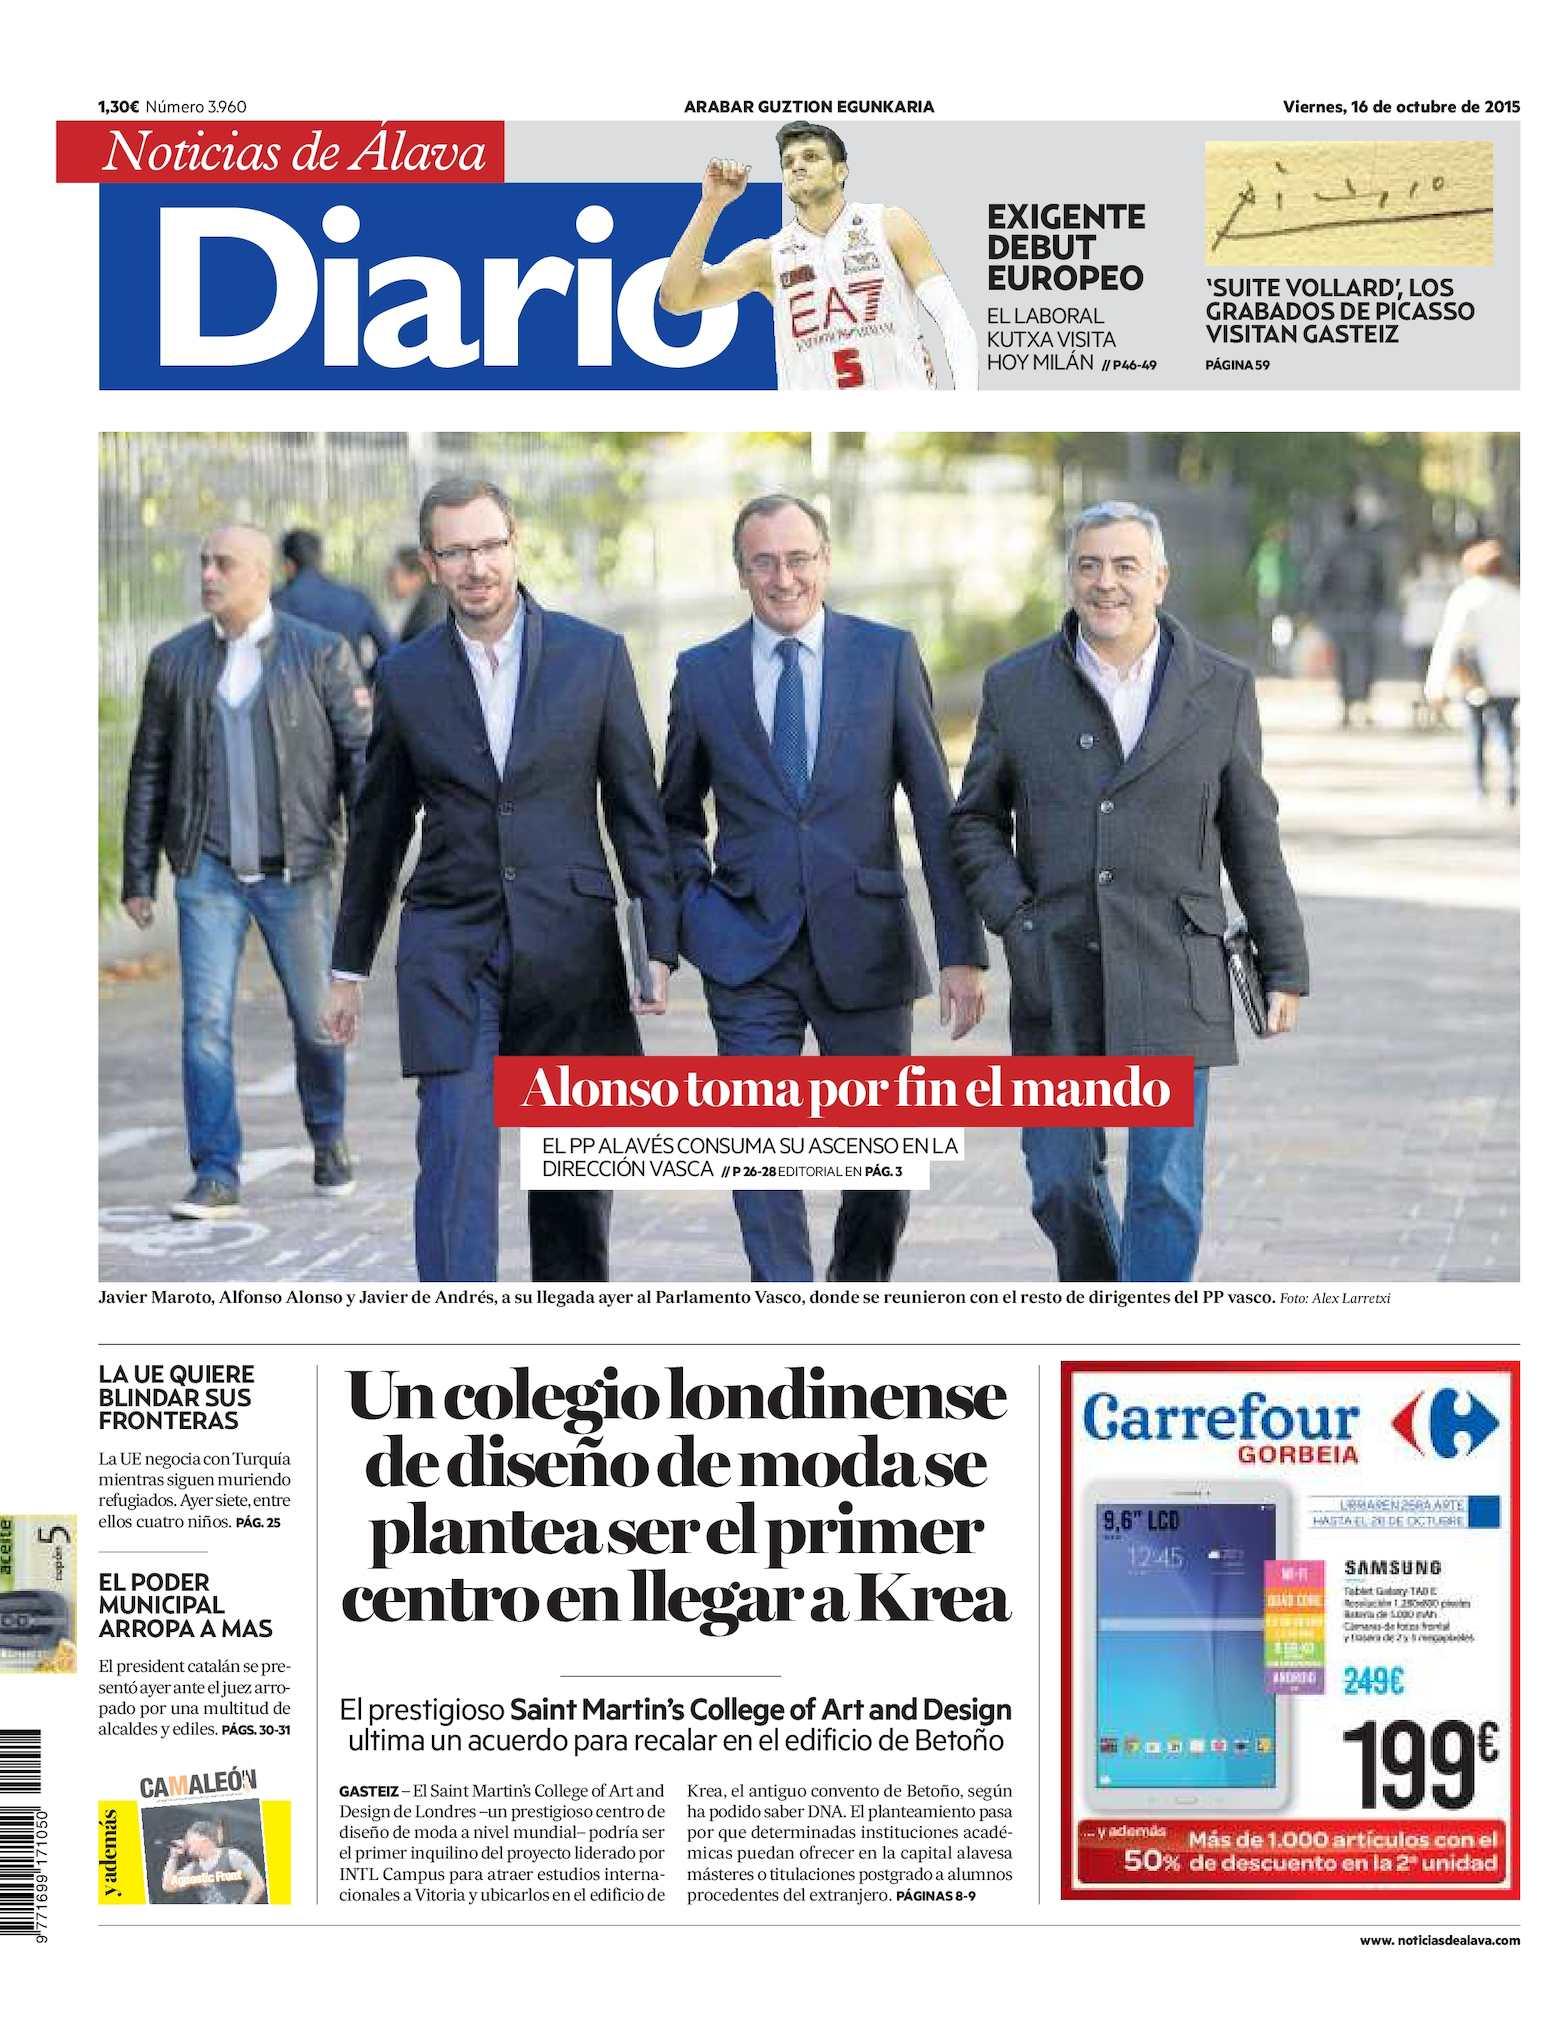 Calaméo - Diario de Noticias de Álava 20151016 7c6c950de524